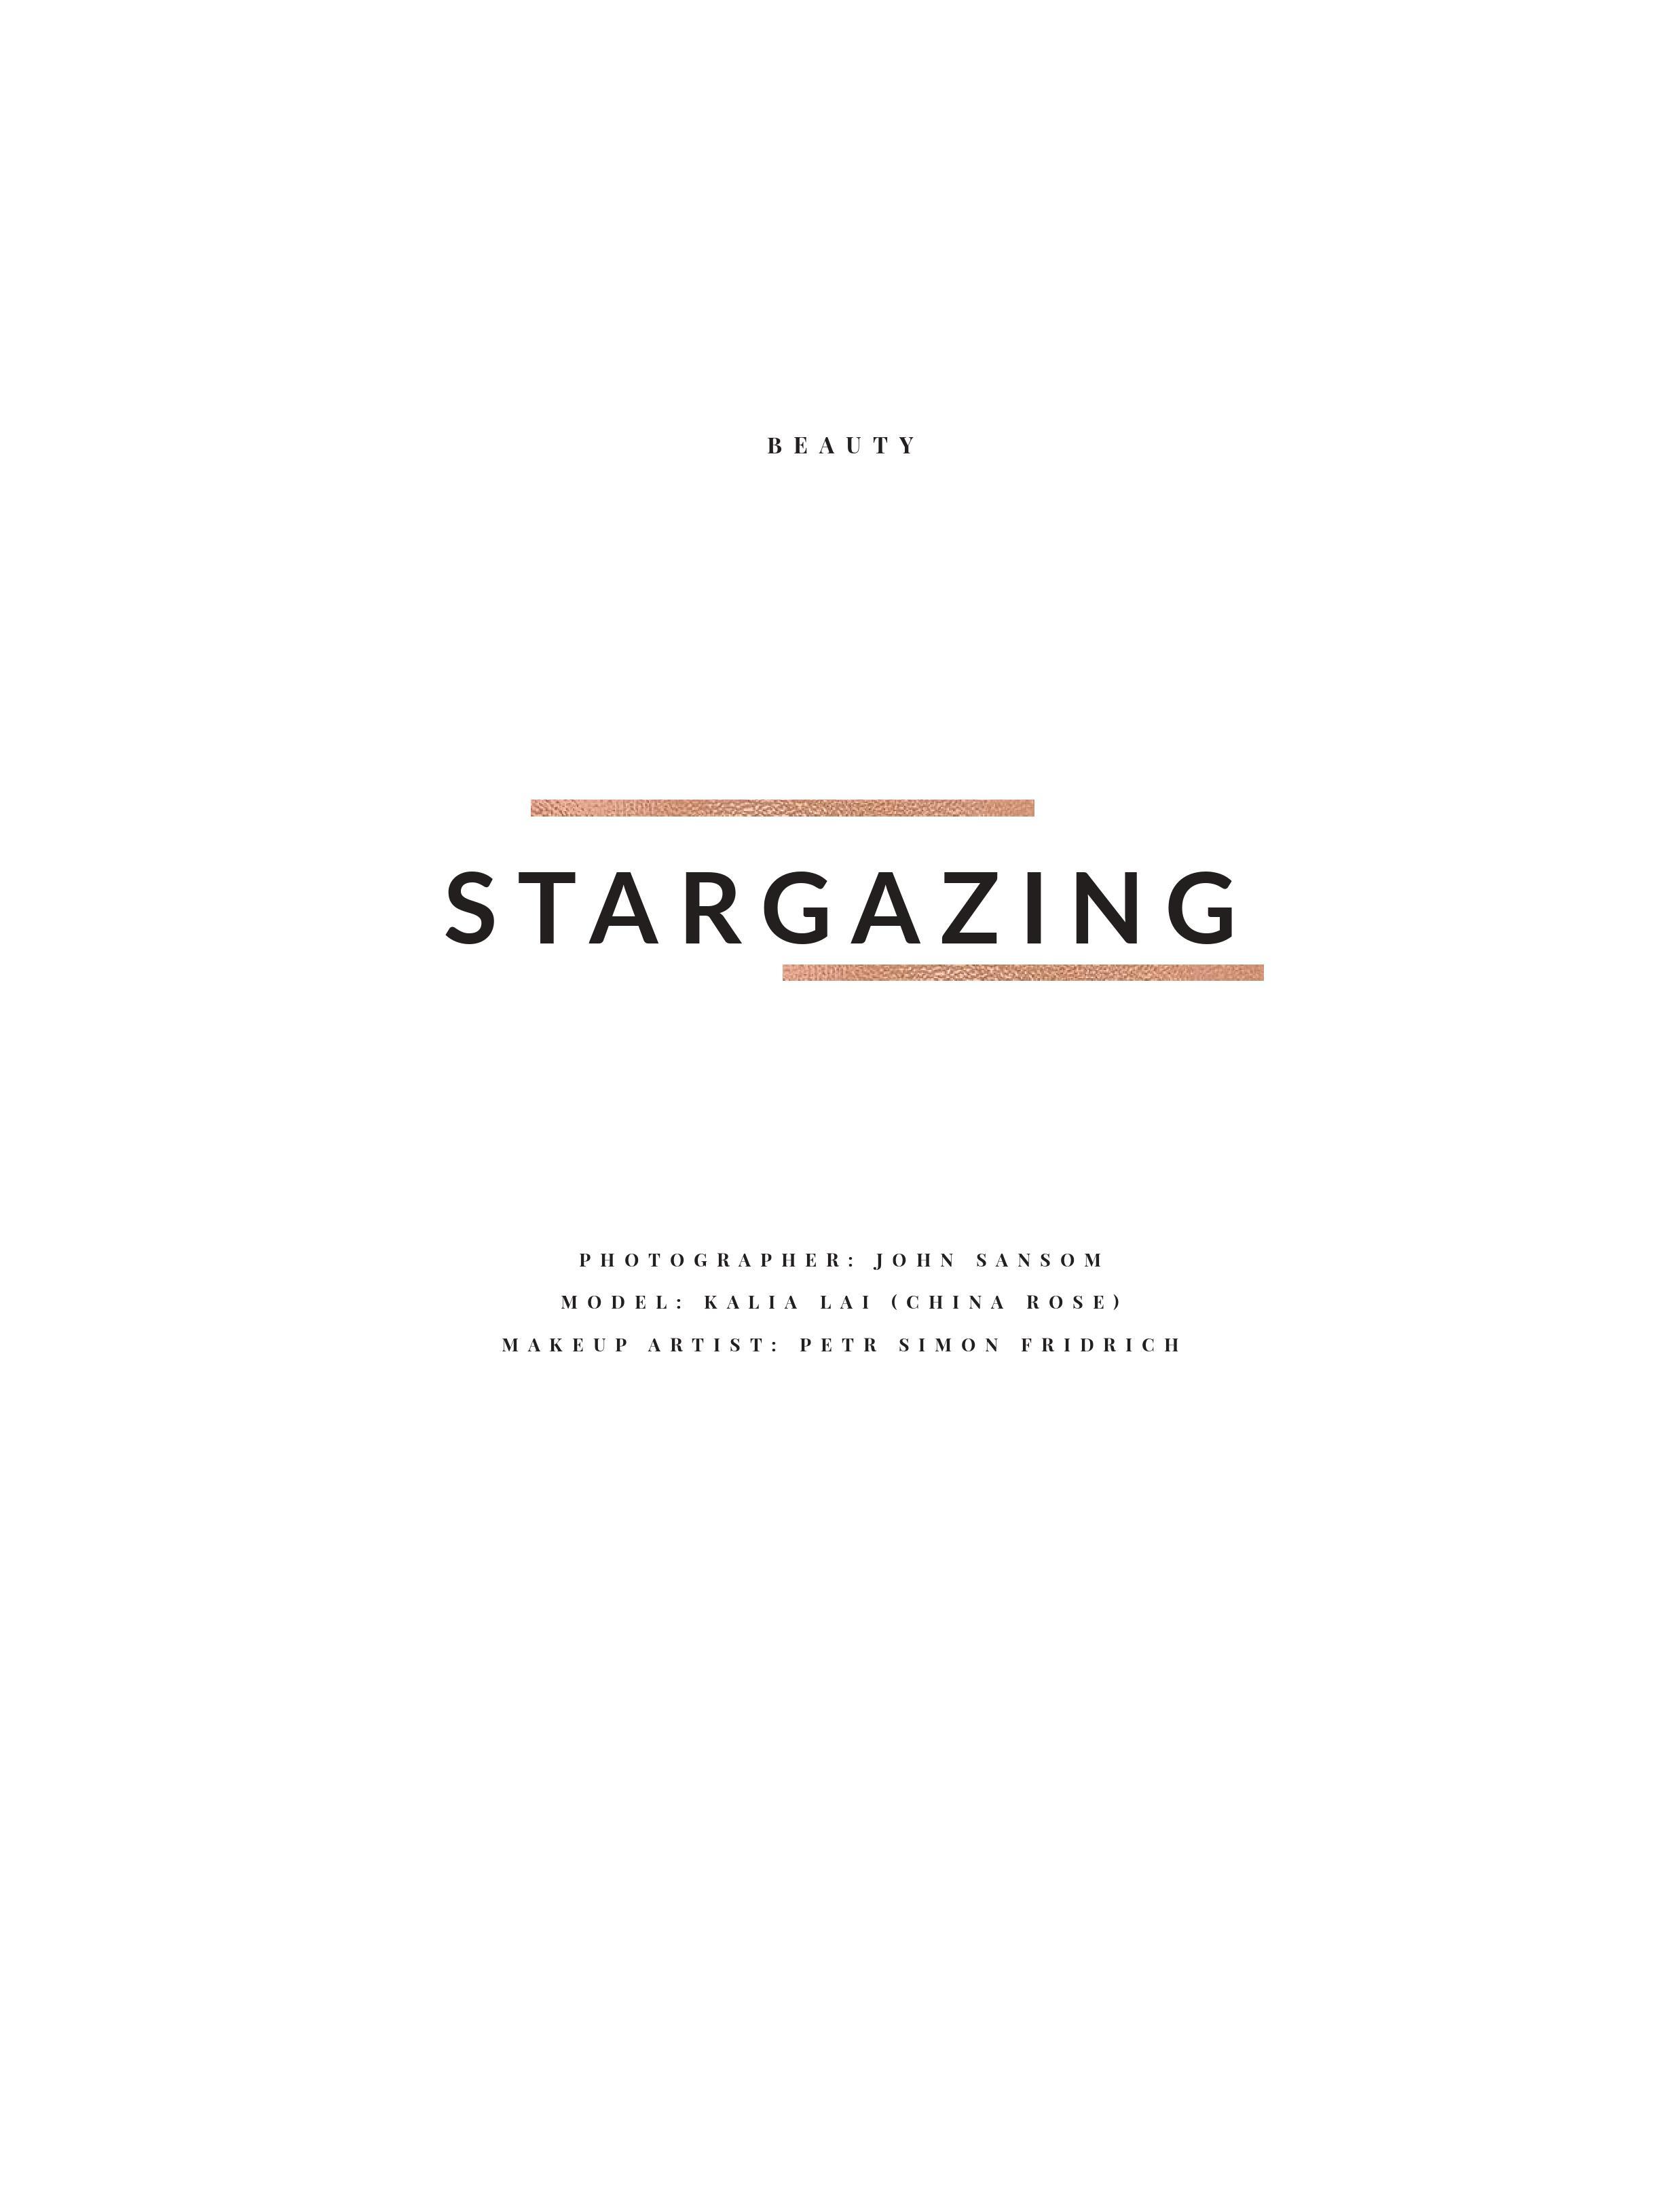 Stargazing - Elegegant Magazine story cover page